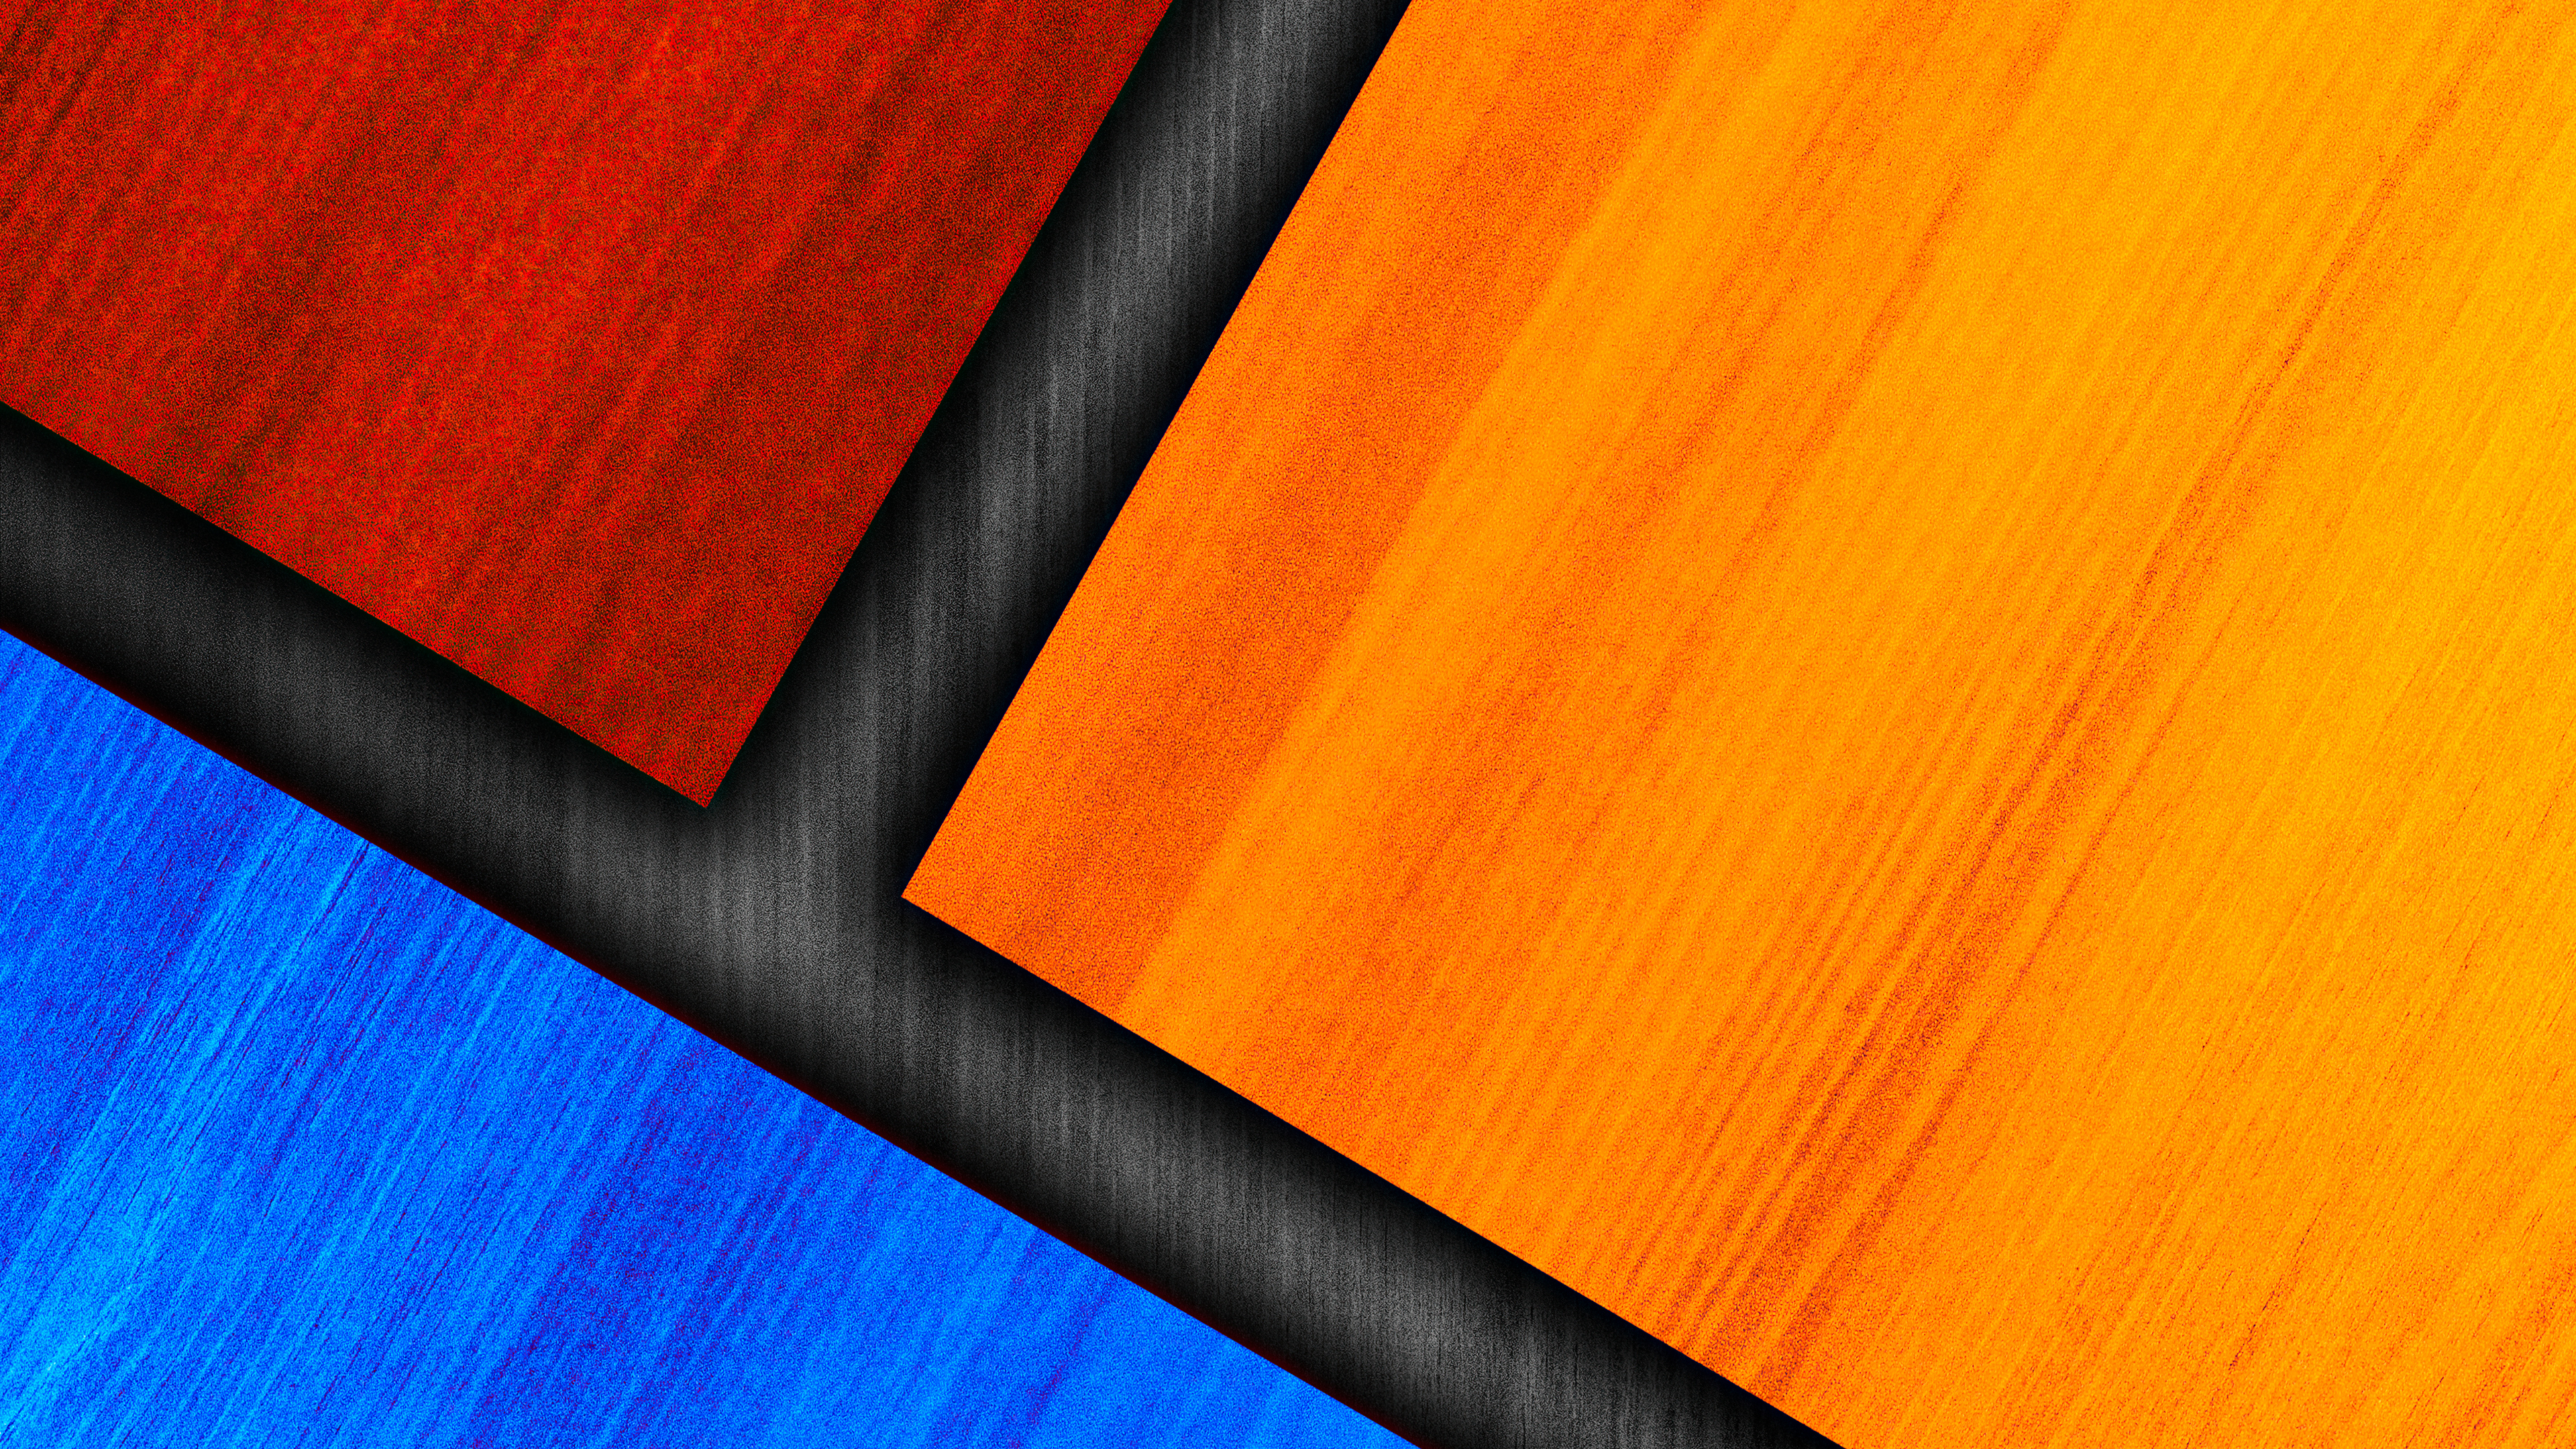 color wood window 4k 1634163652 - Color Wood Window 4k - Color Wood Window wallpapers, Color Wood Window 4k wallpapers